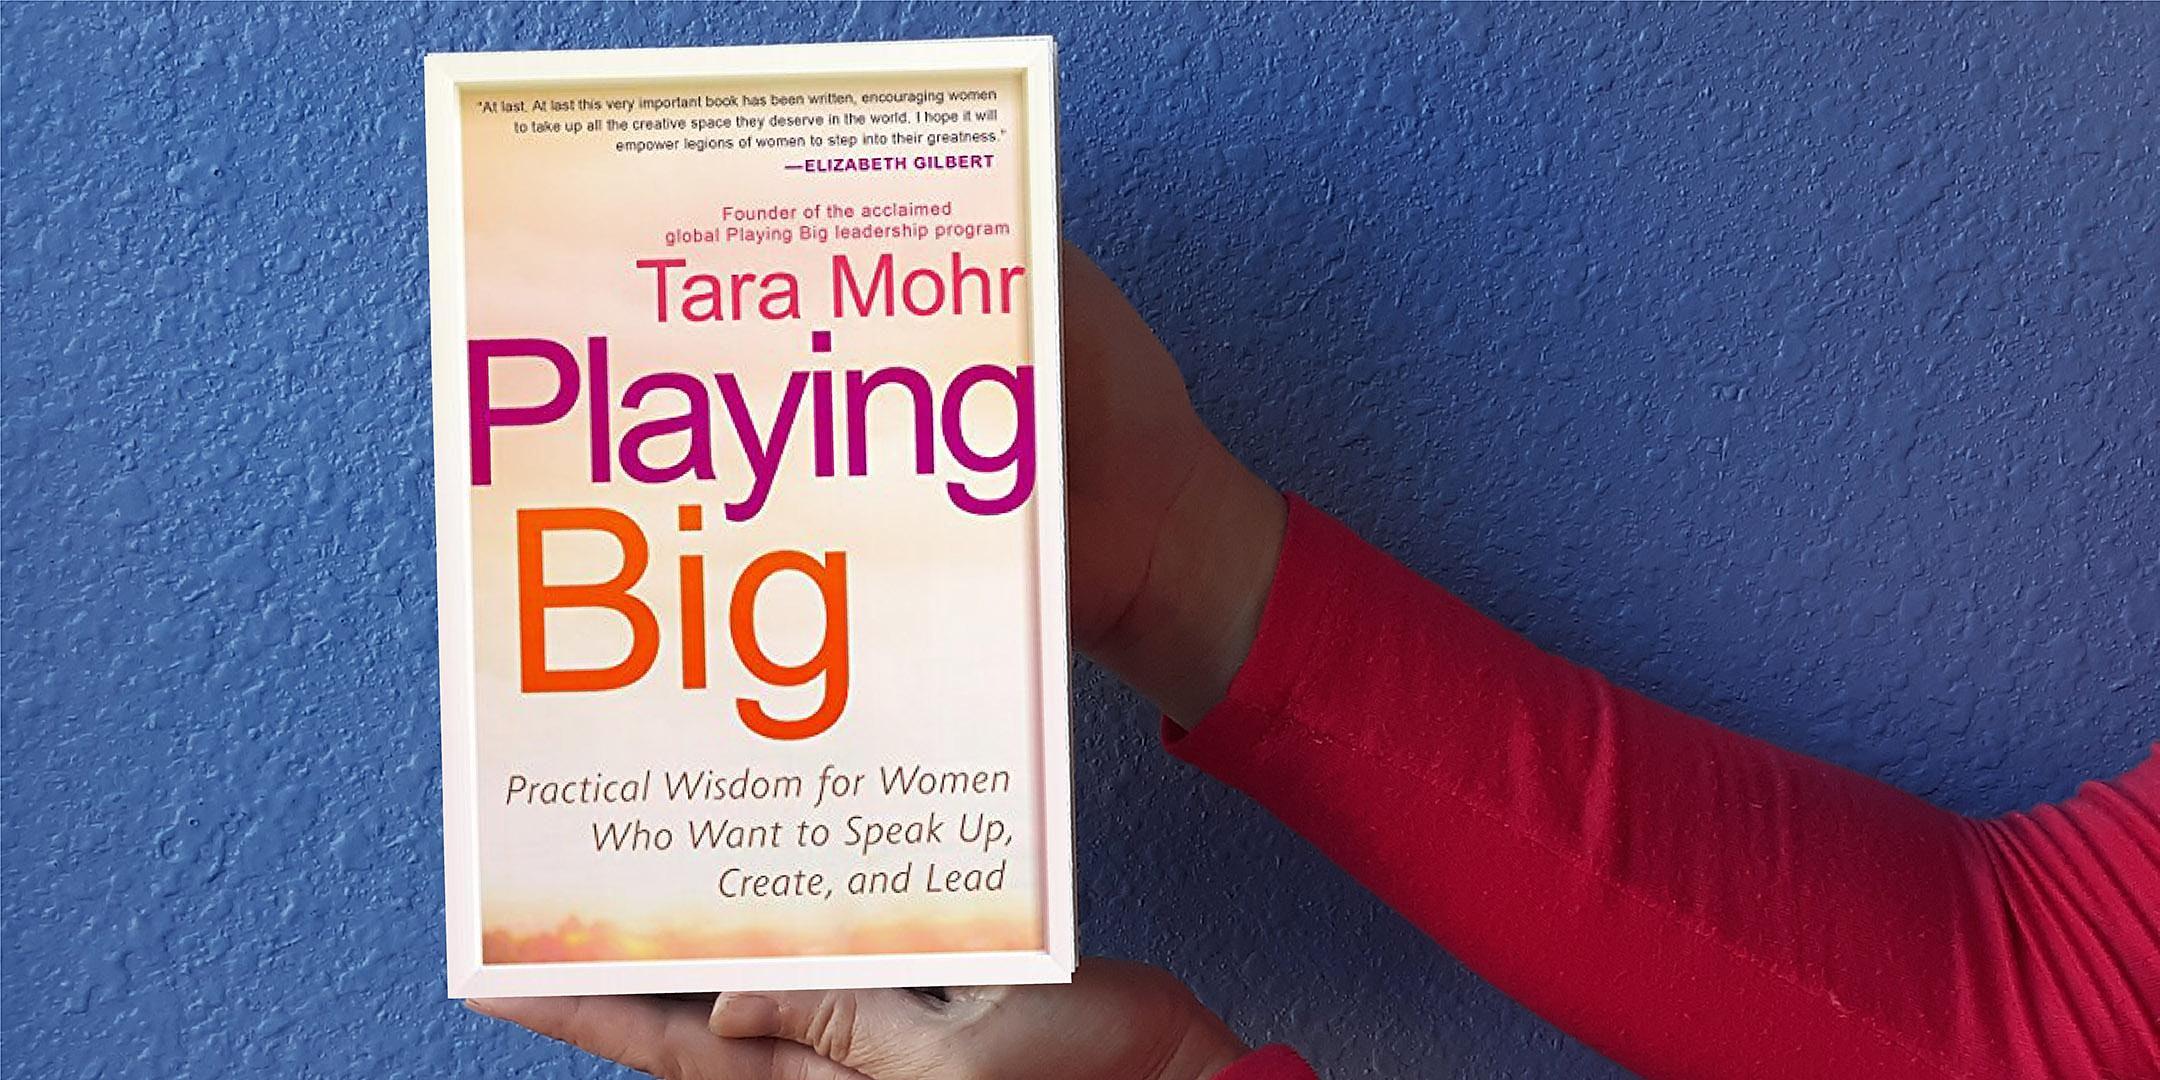 What's Next? Book Club (Virtual) - Playing Big Part II